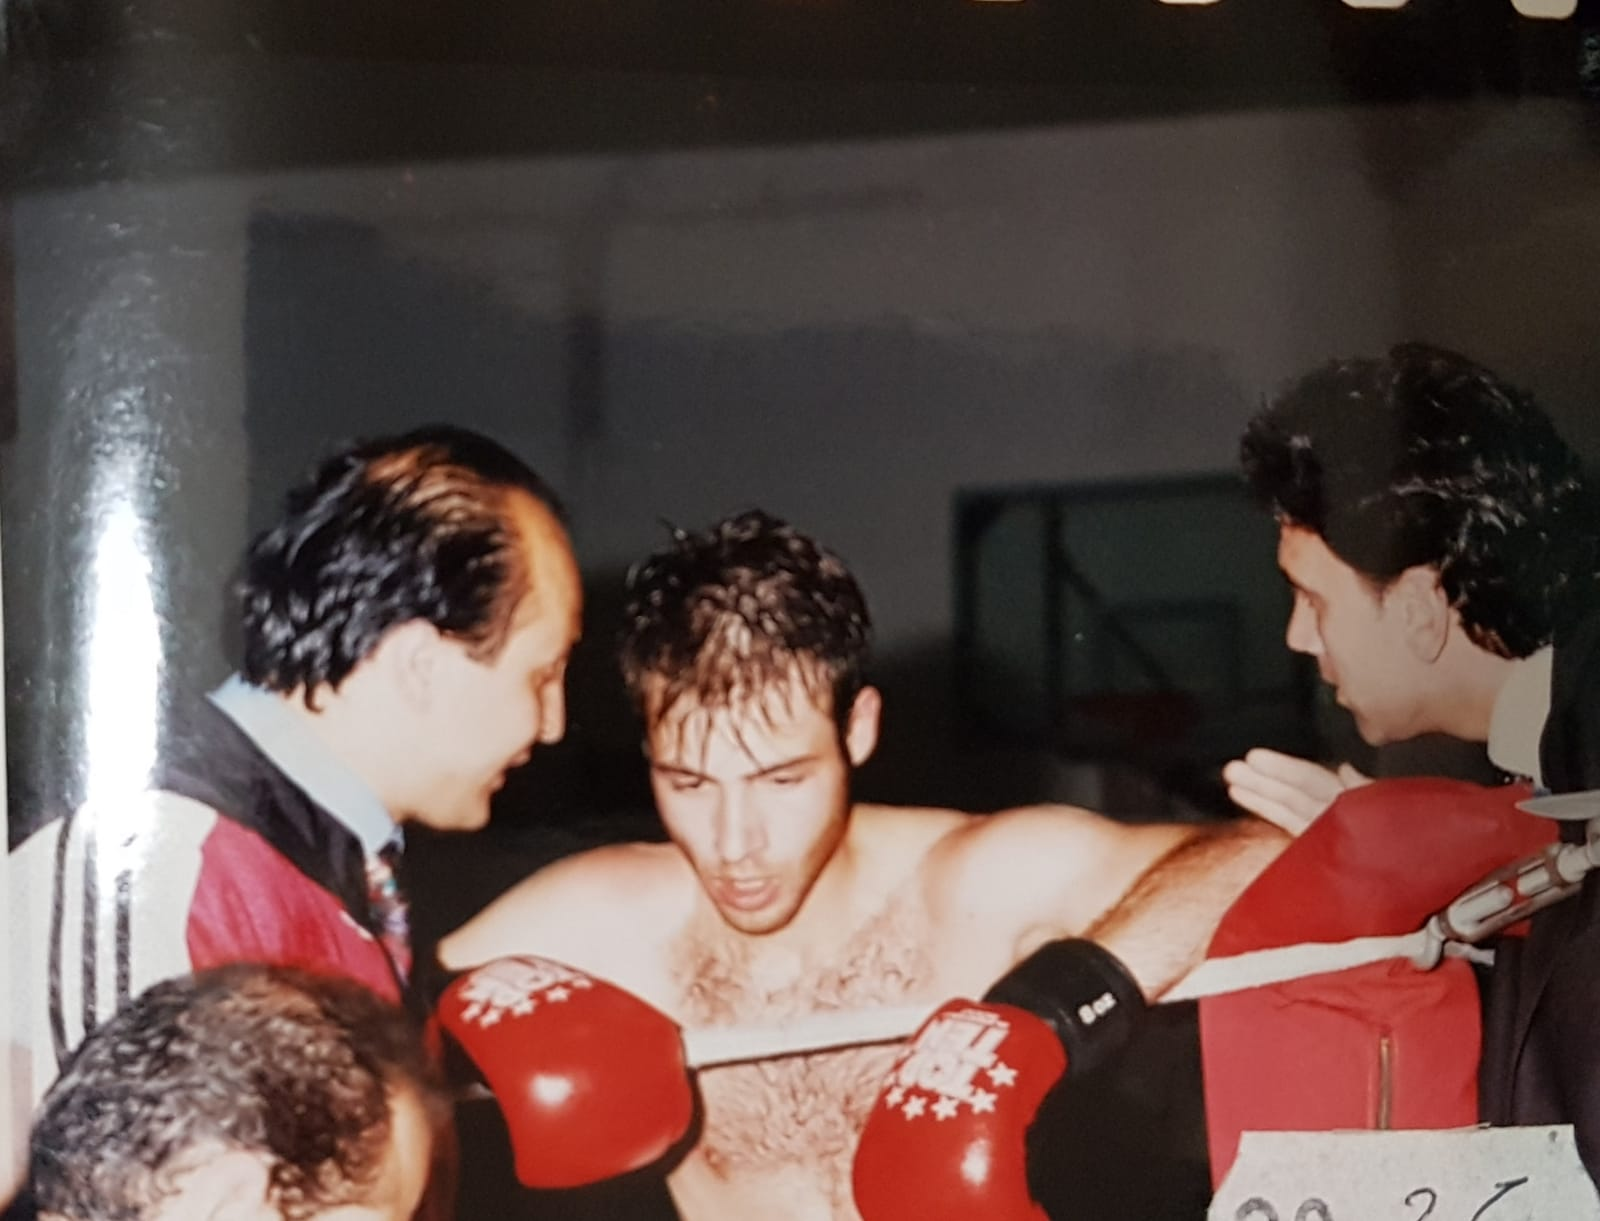 Giuseppe Lorusso e Gianni Befà